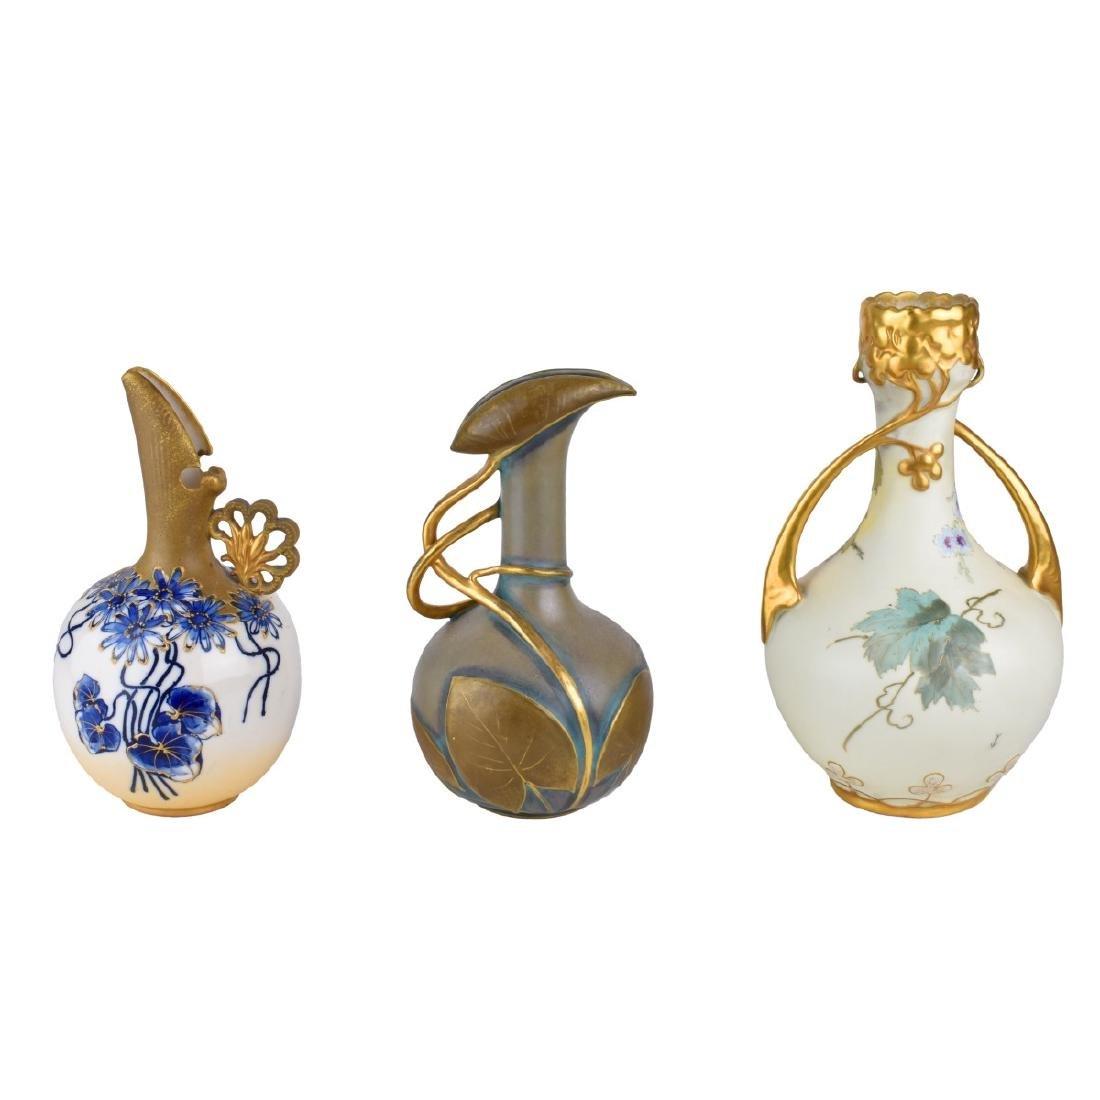 Turn Teplitz Pottery Pitchers and Vase